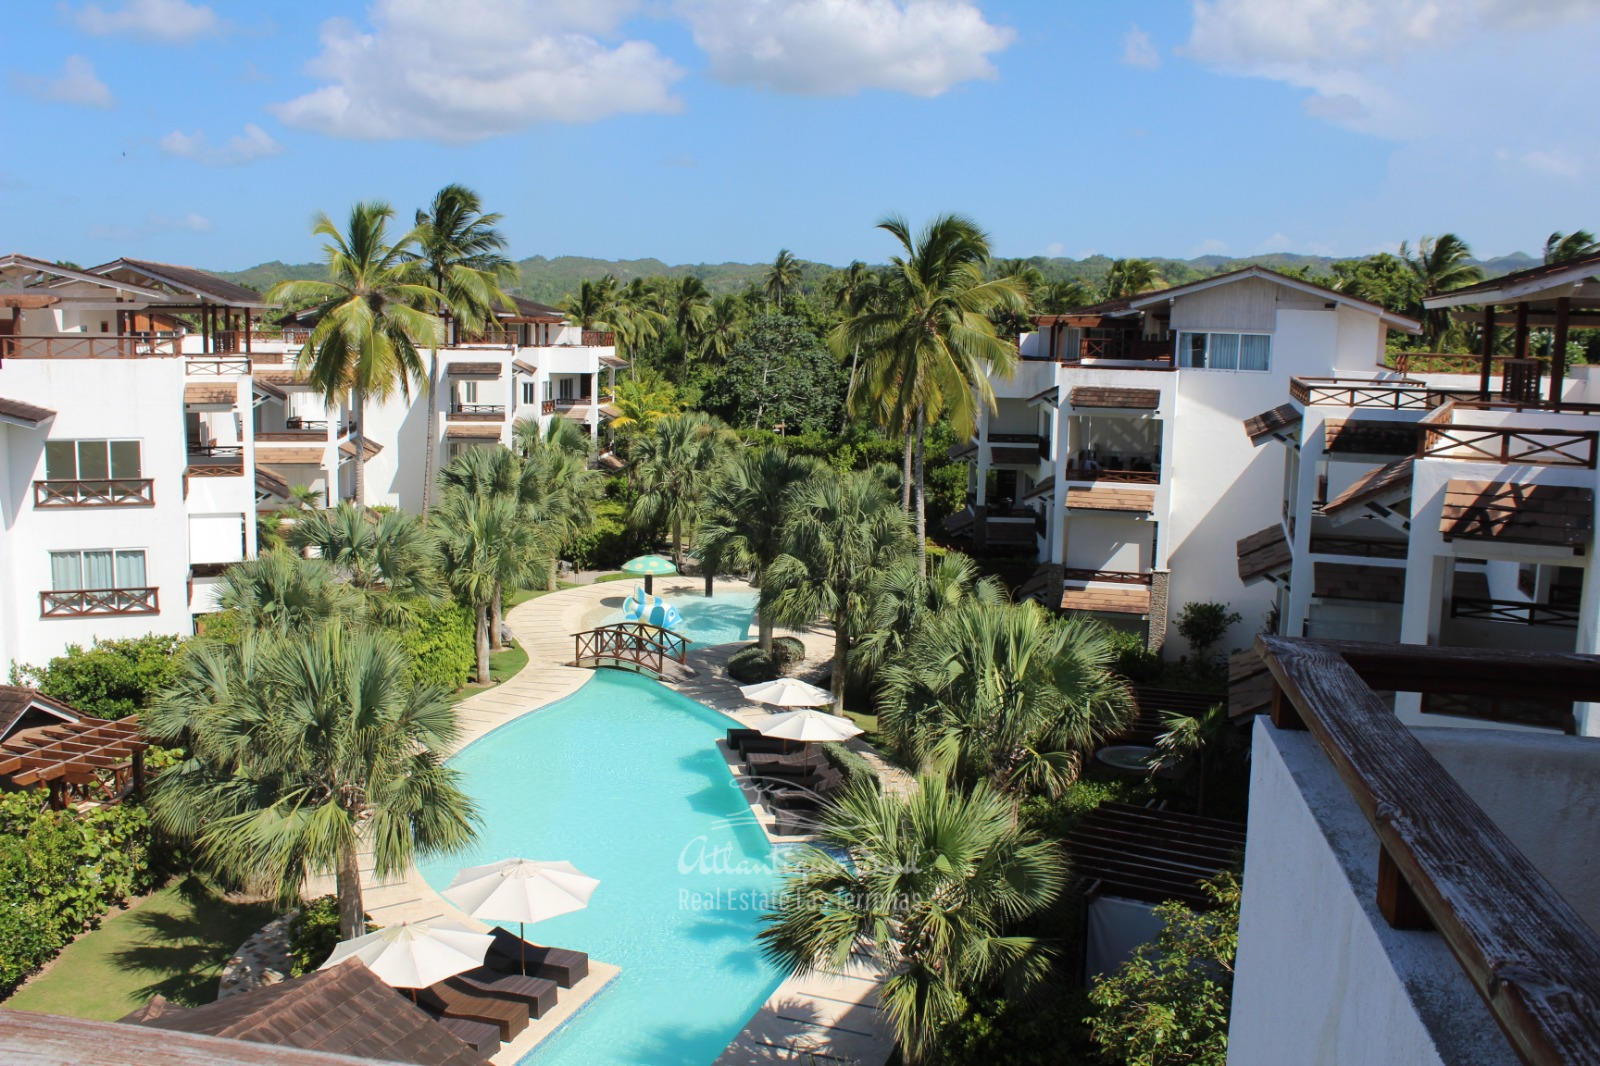 Apartments near the beach real estate las terrenas dominican republic 31 (30).jpg